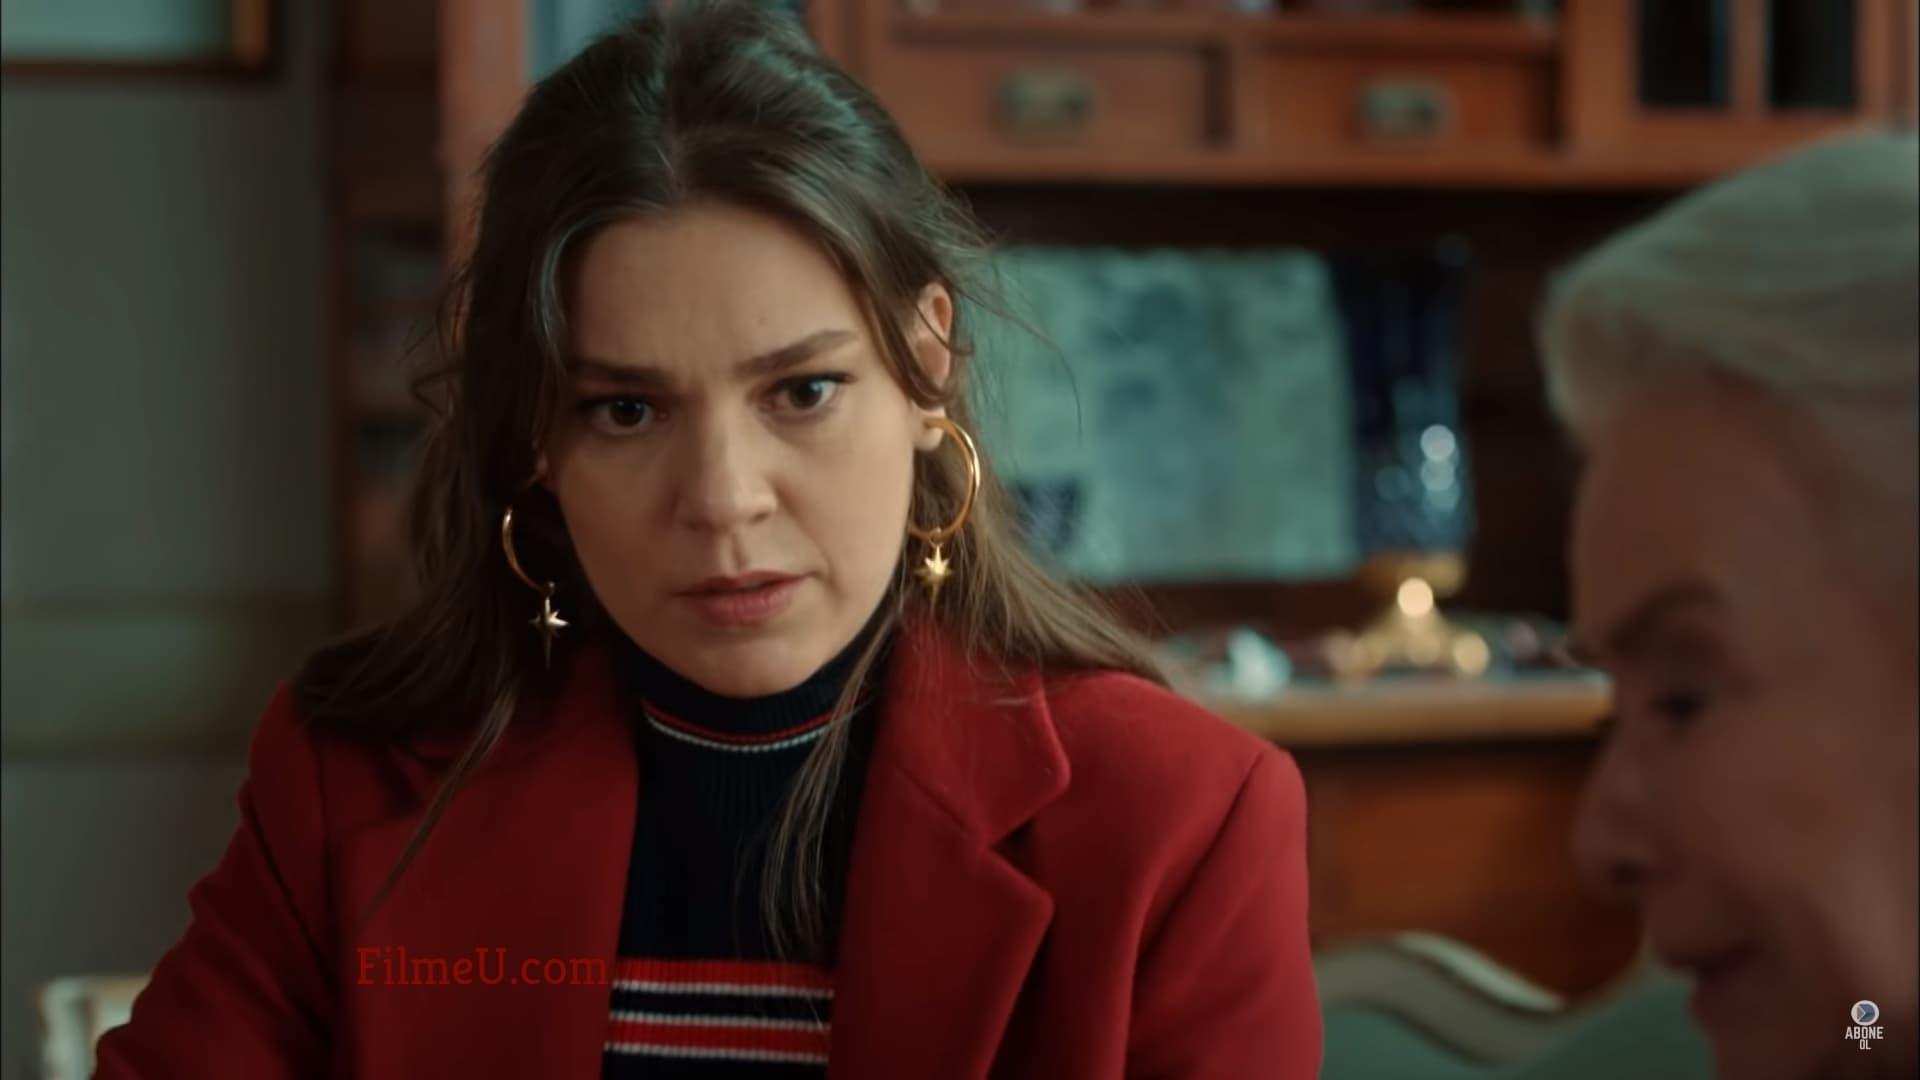 Mireasa din Istanbul - Episodul 73 - Online Subtitrat În